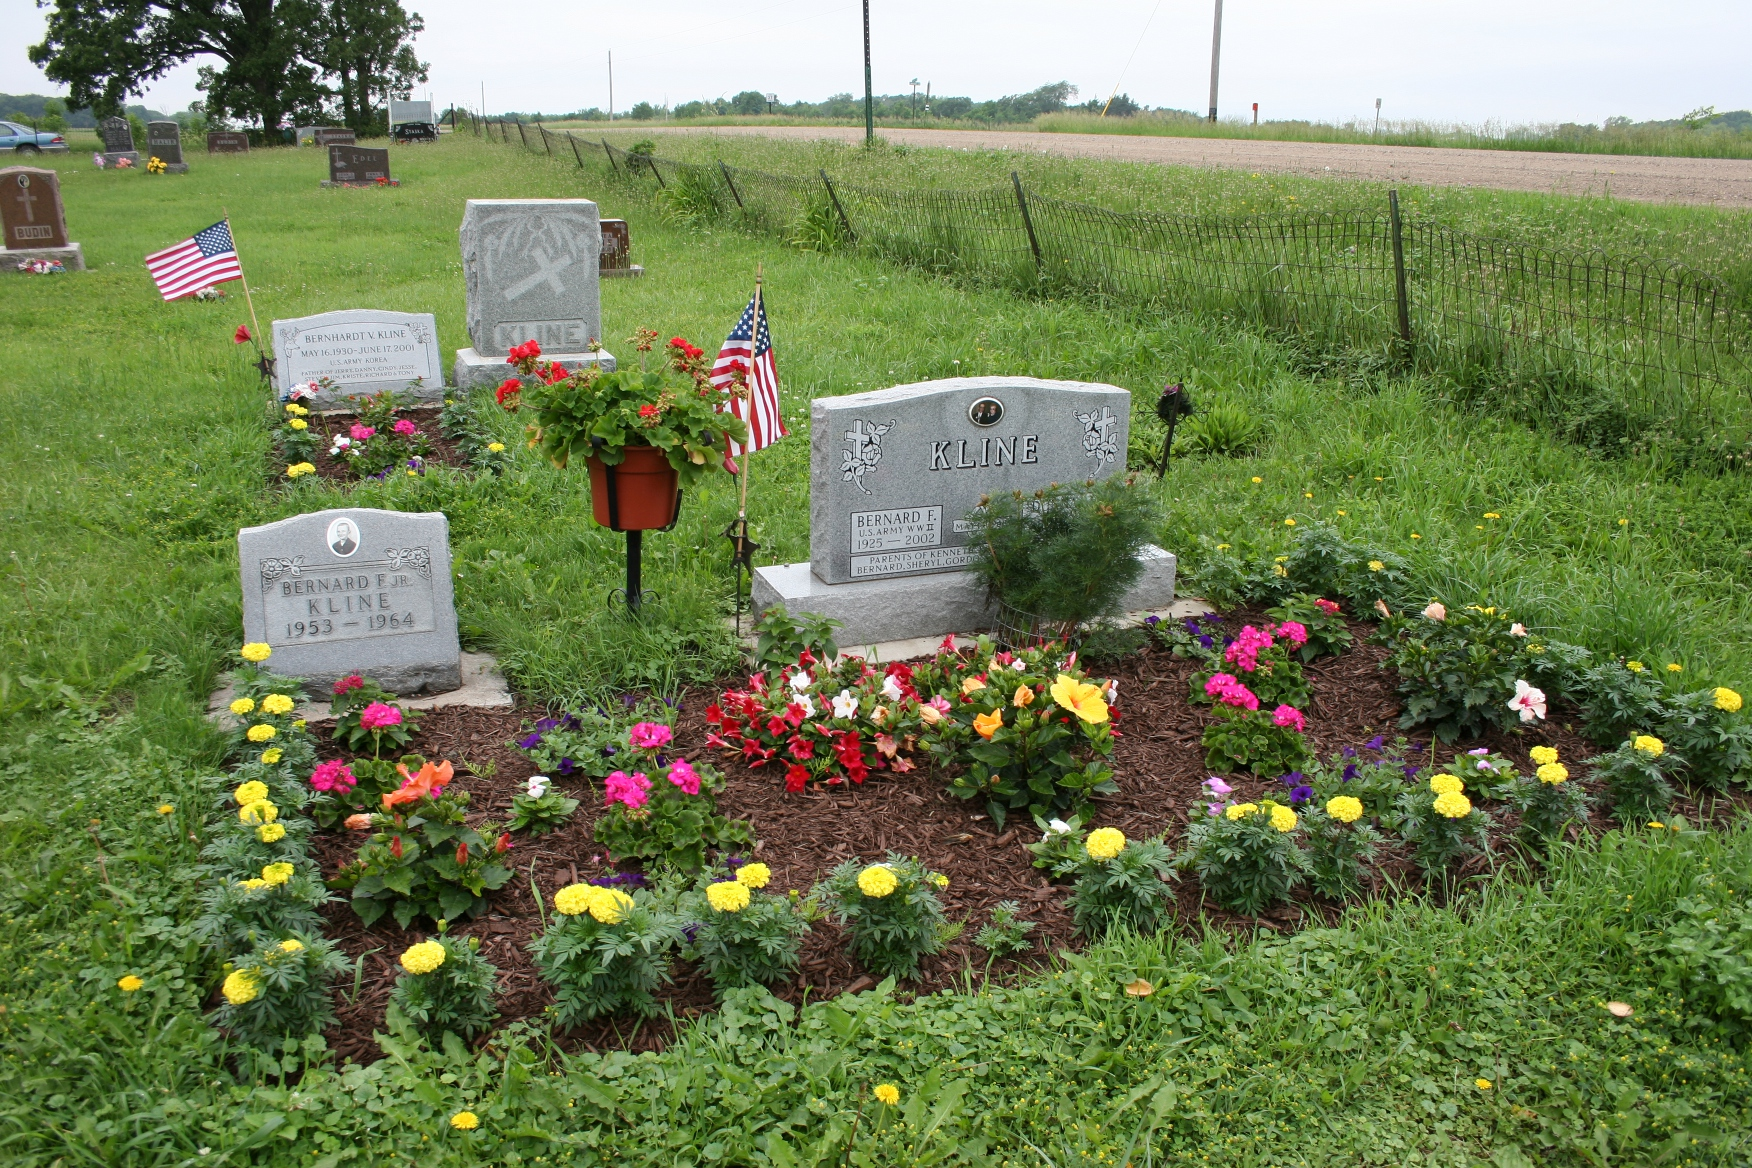 Trebon, Kline graves | Minnesota Prairie Roots